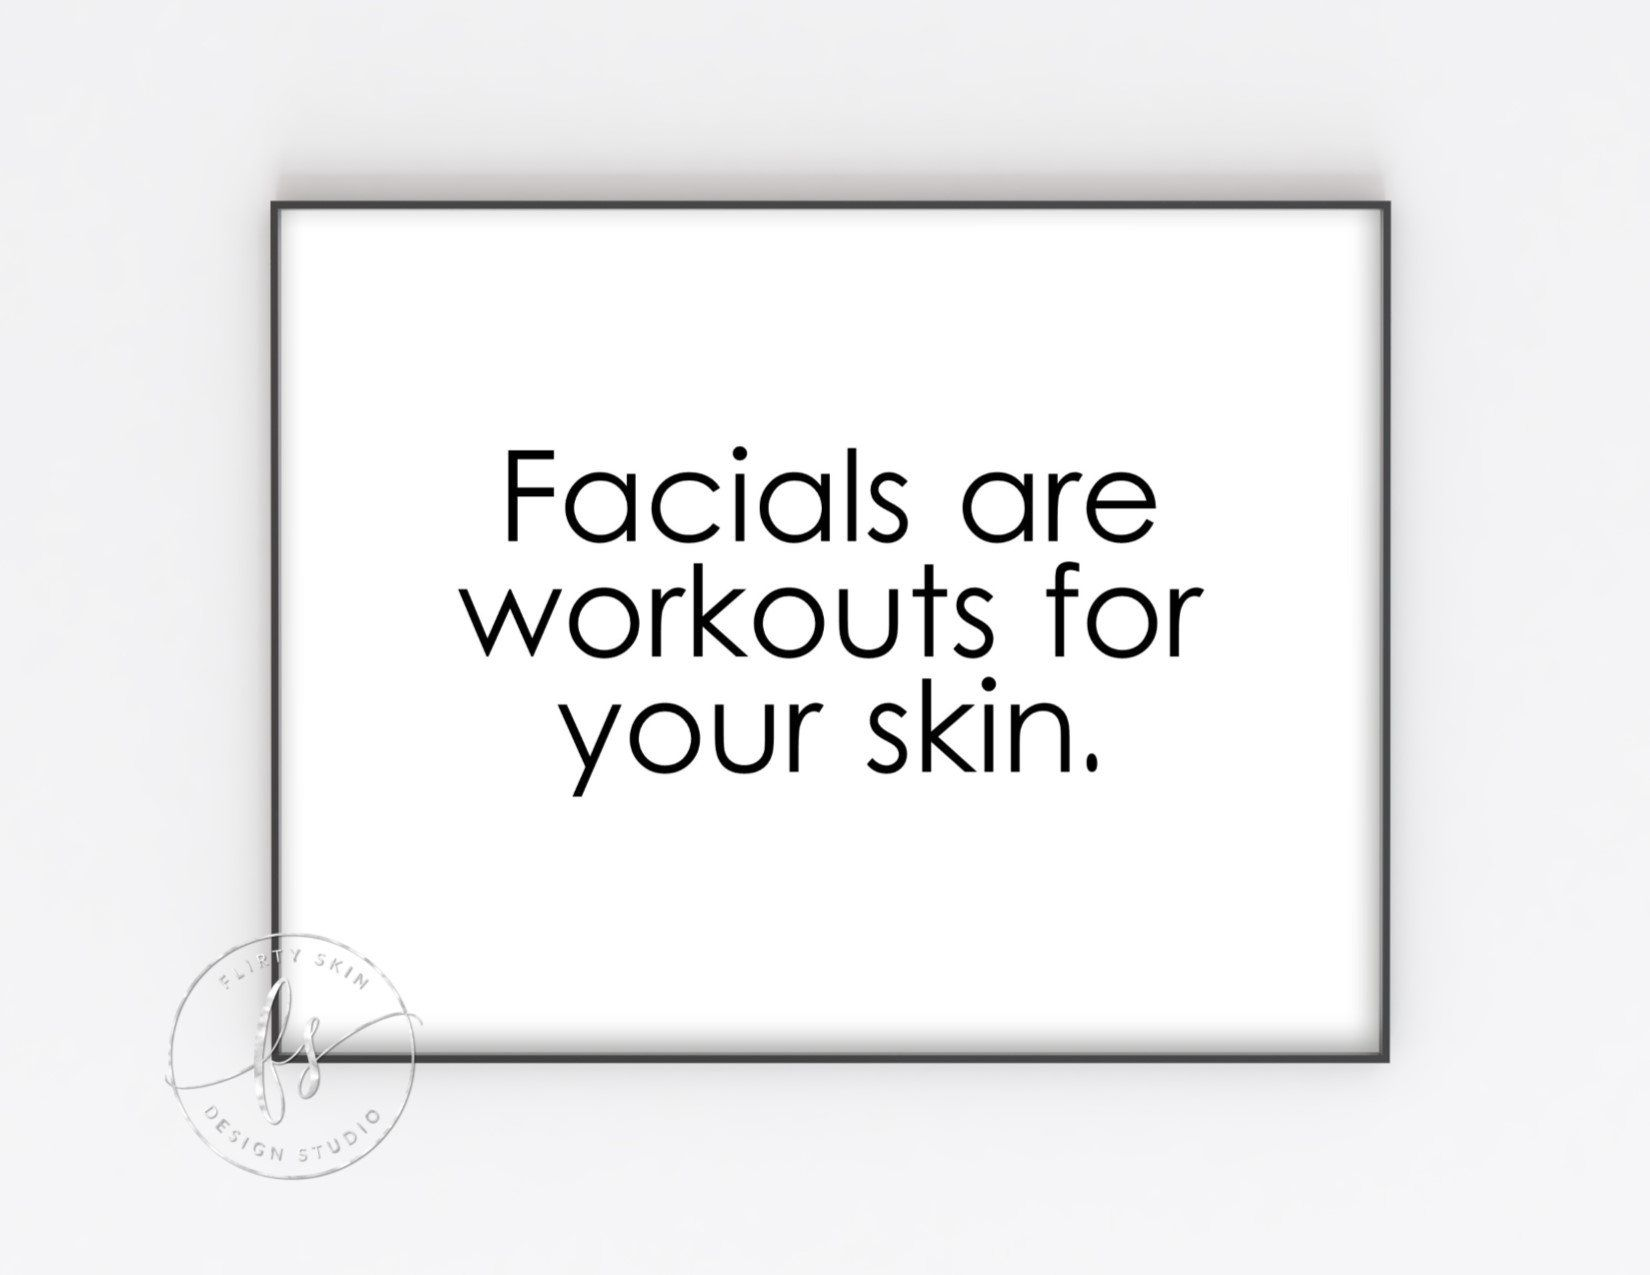 Facials are workouts for your skin | Skin Care Quote | Esthetician Decor | Spa Quote | Spa | Salon | Esthetician | Facials | Wall Quote -   14 skin care Memes gift ideas